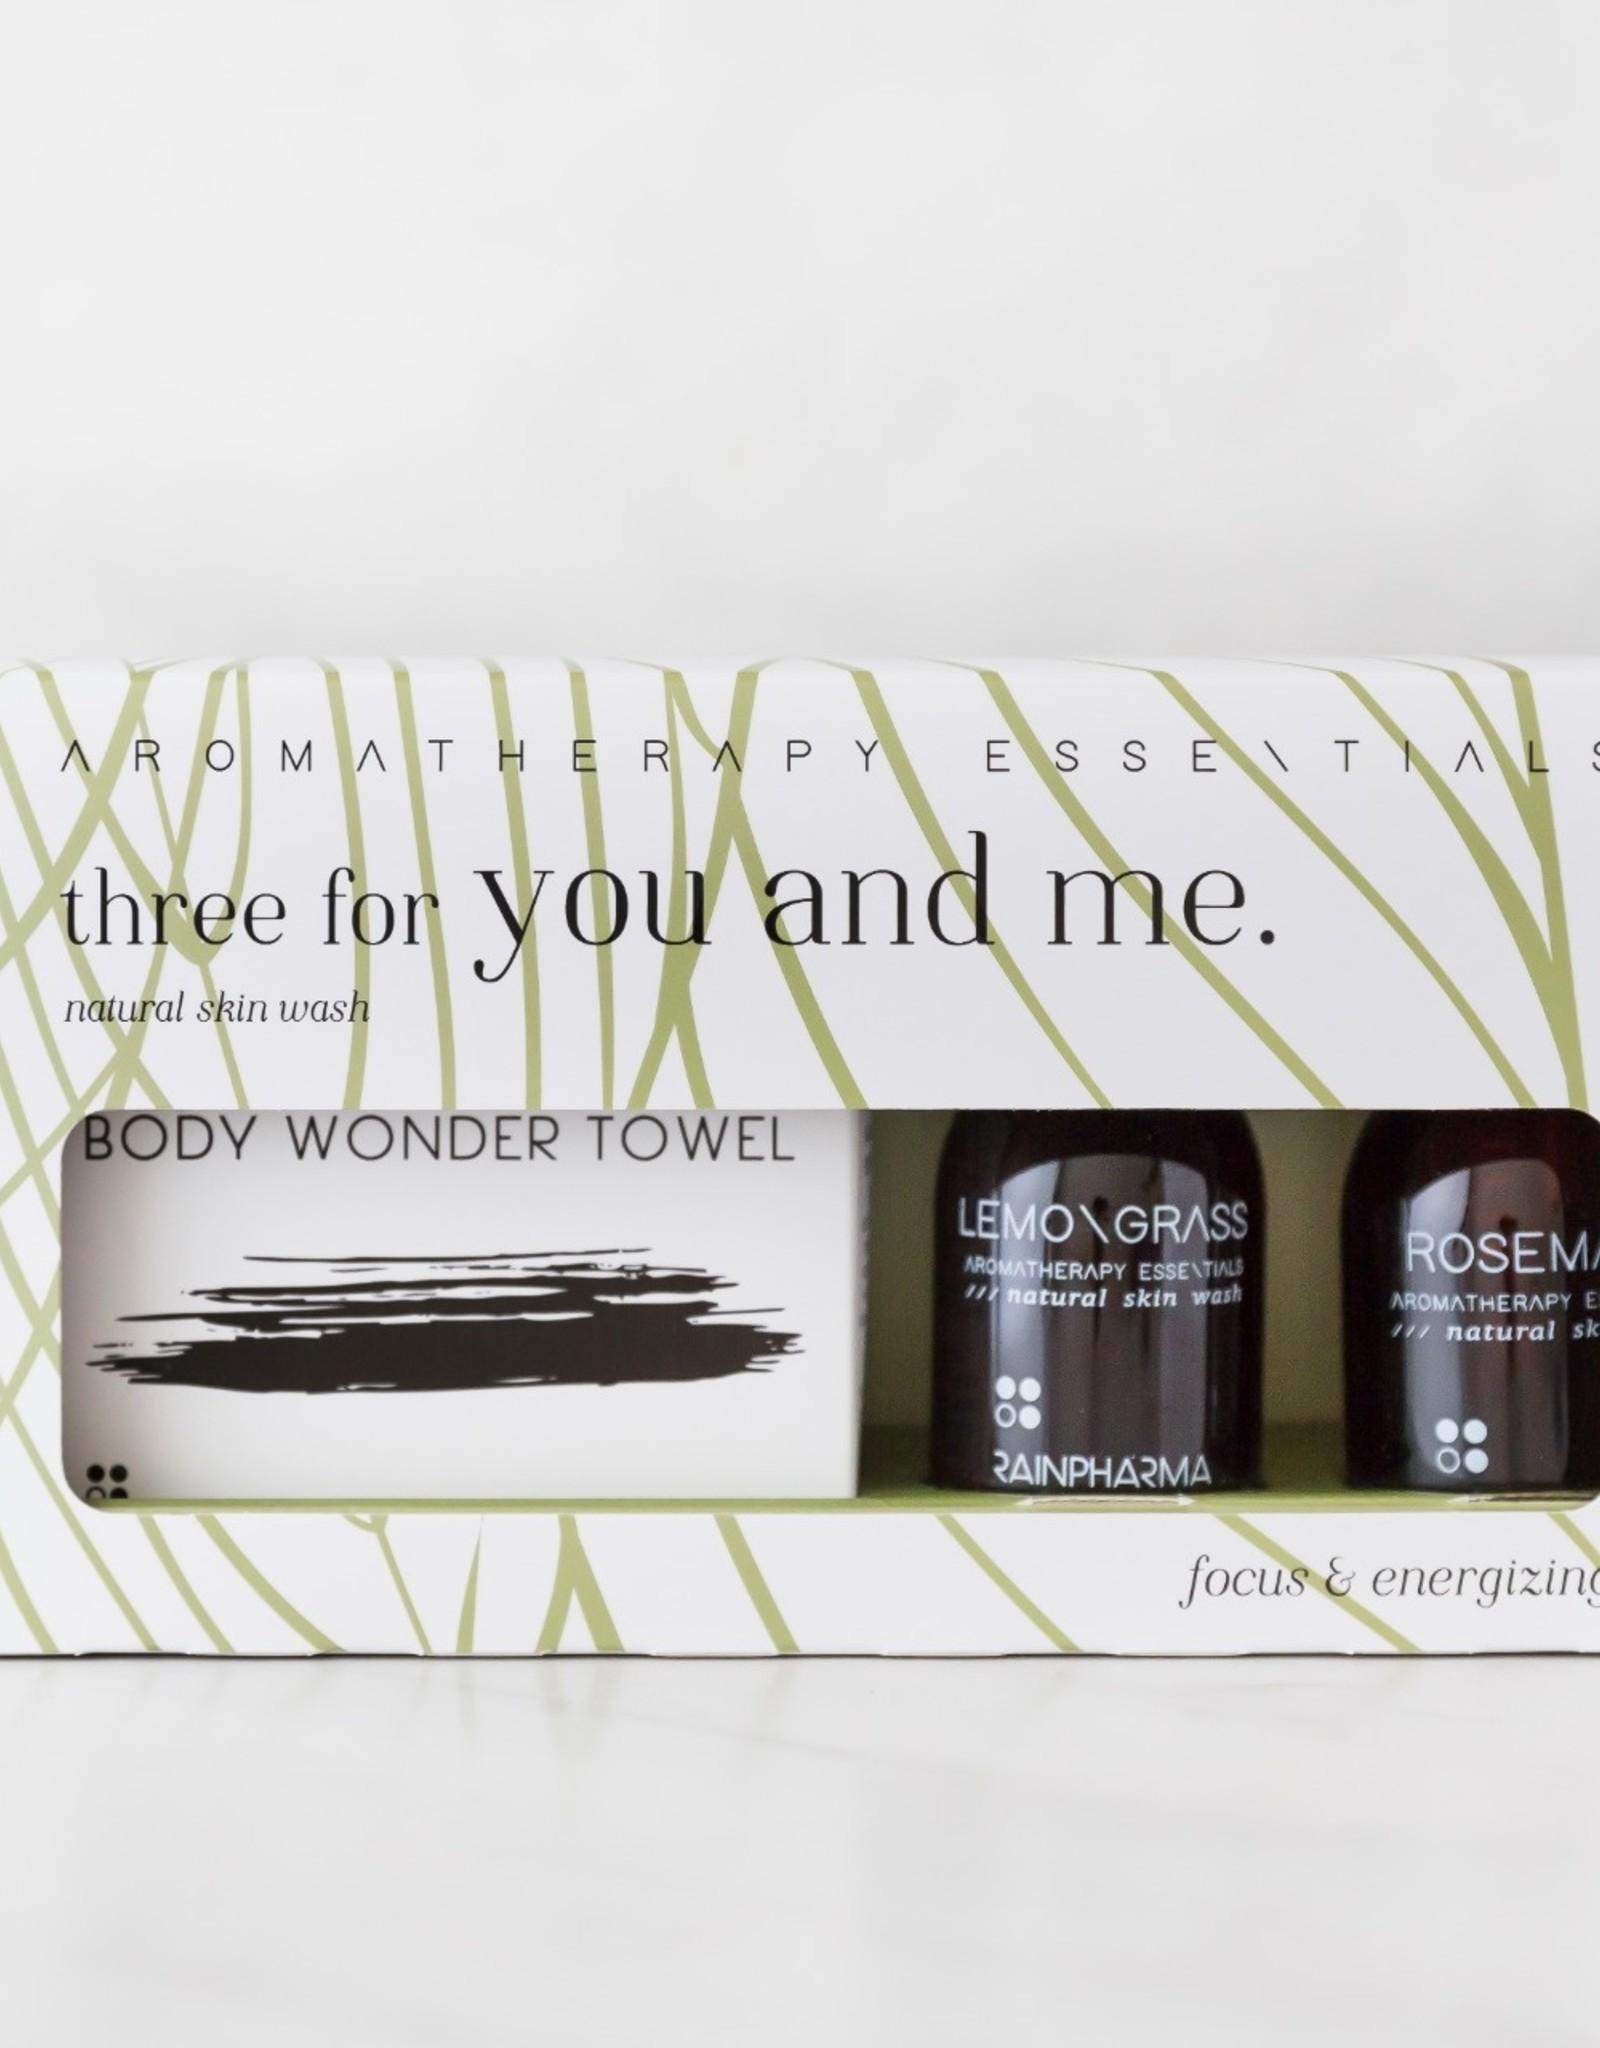 RainPharma Three For You And Me - Focus & Energizing - Lemongrass/Rosemary